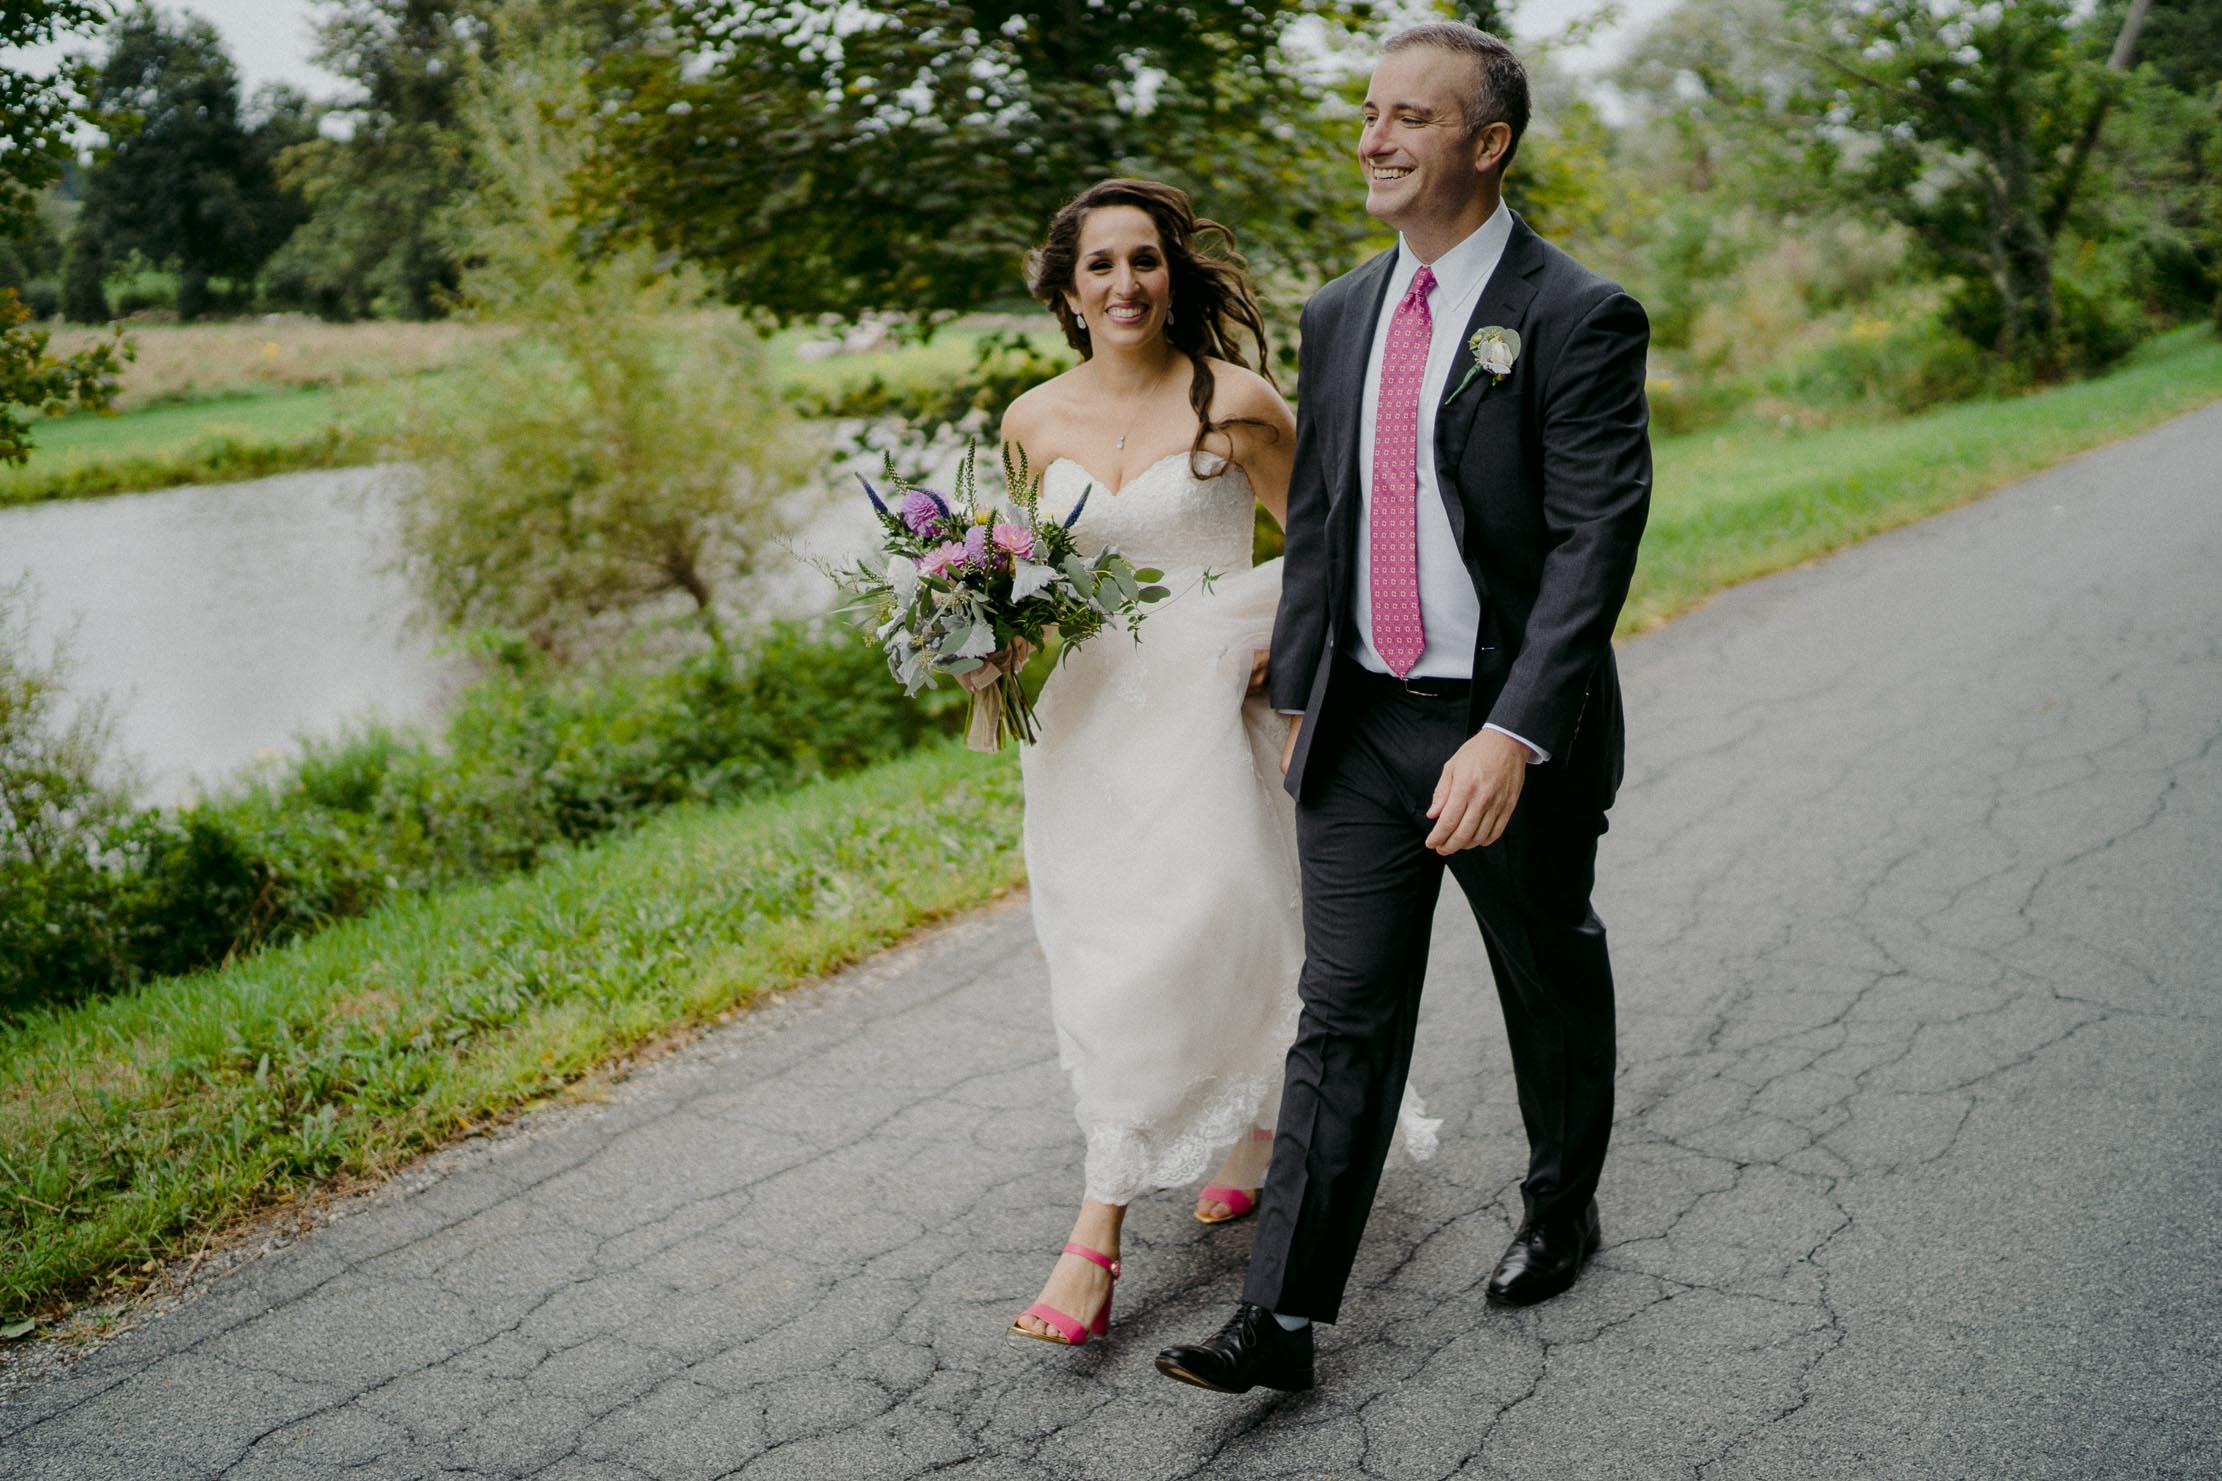 Wings-Castle-Millbrook-NY-Upstate-Wedding-Photographer-1046.jpg